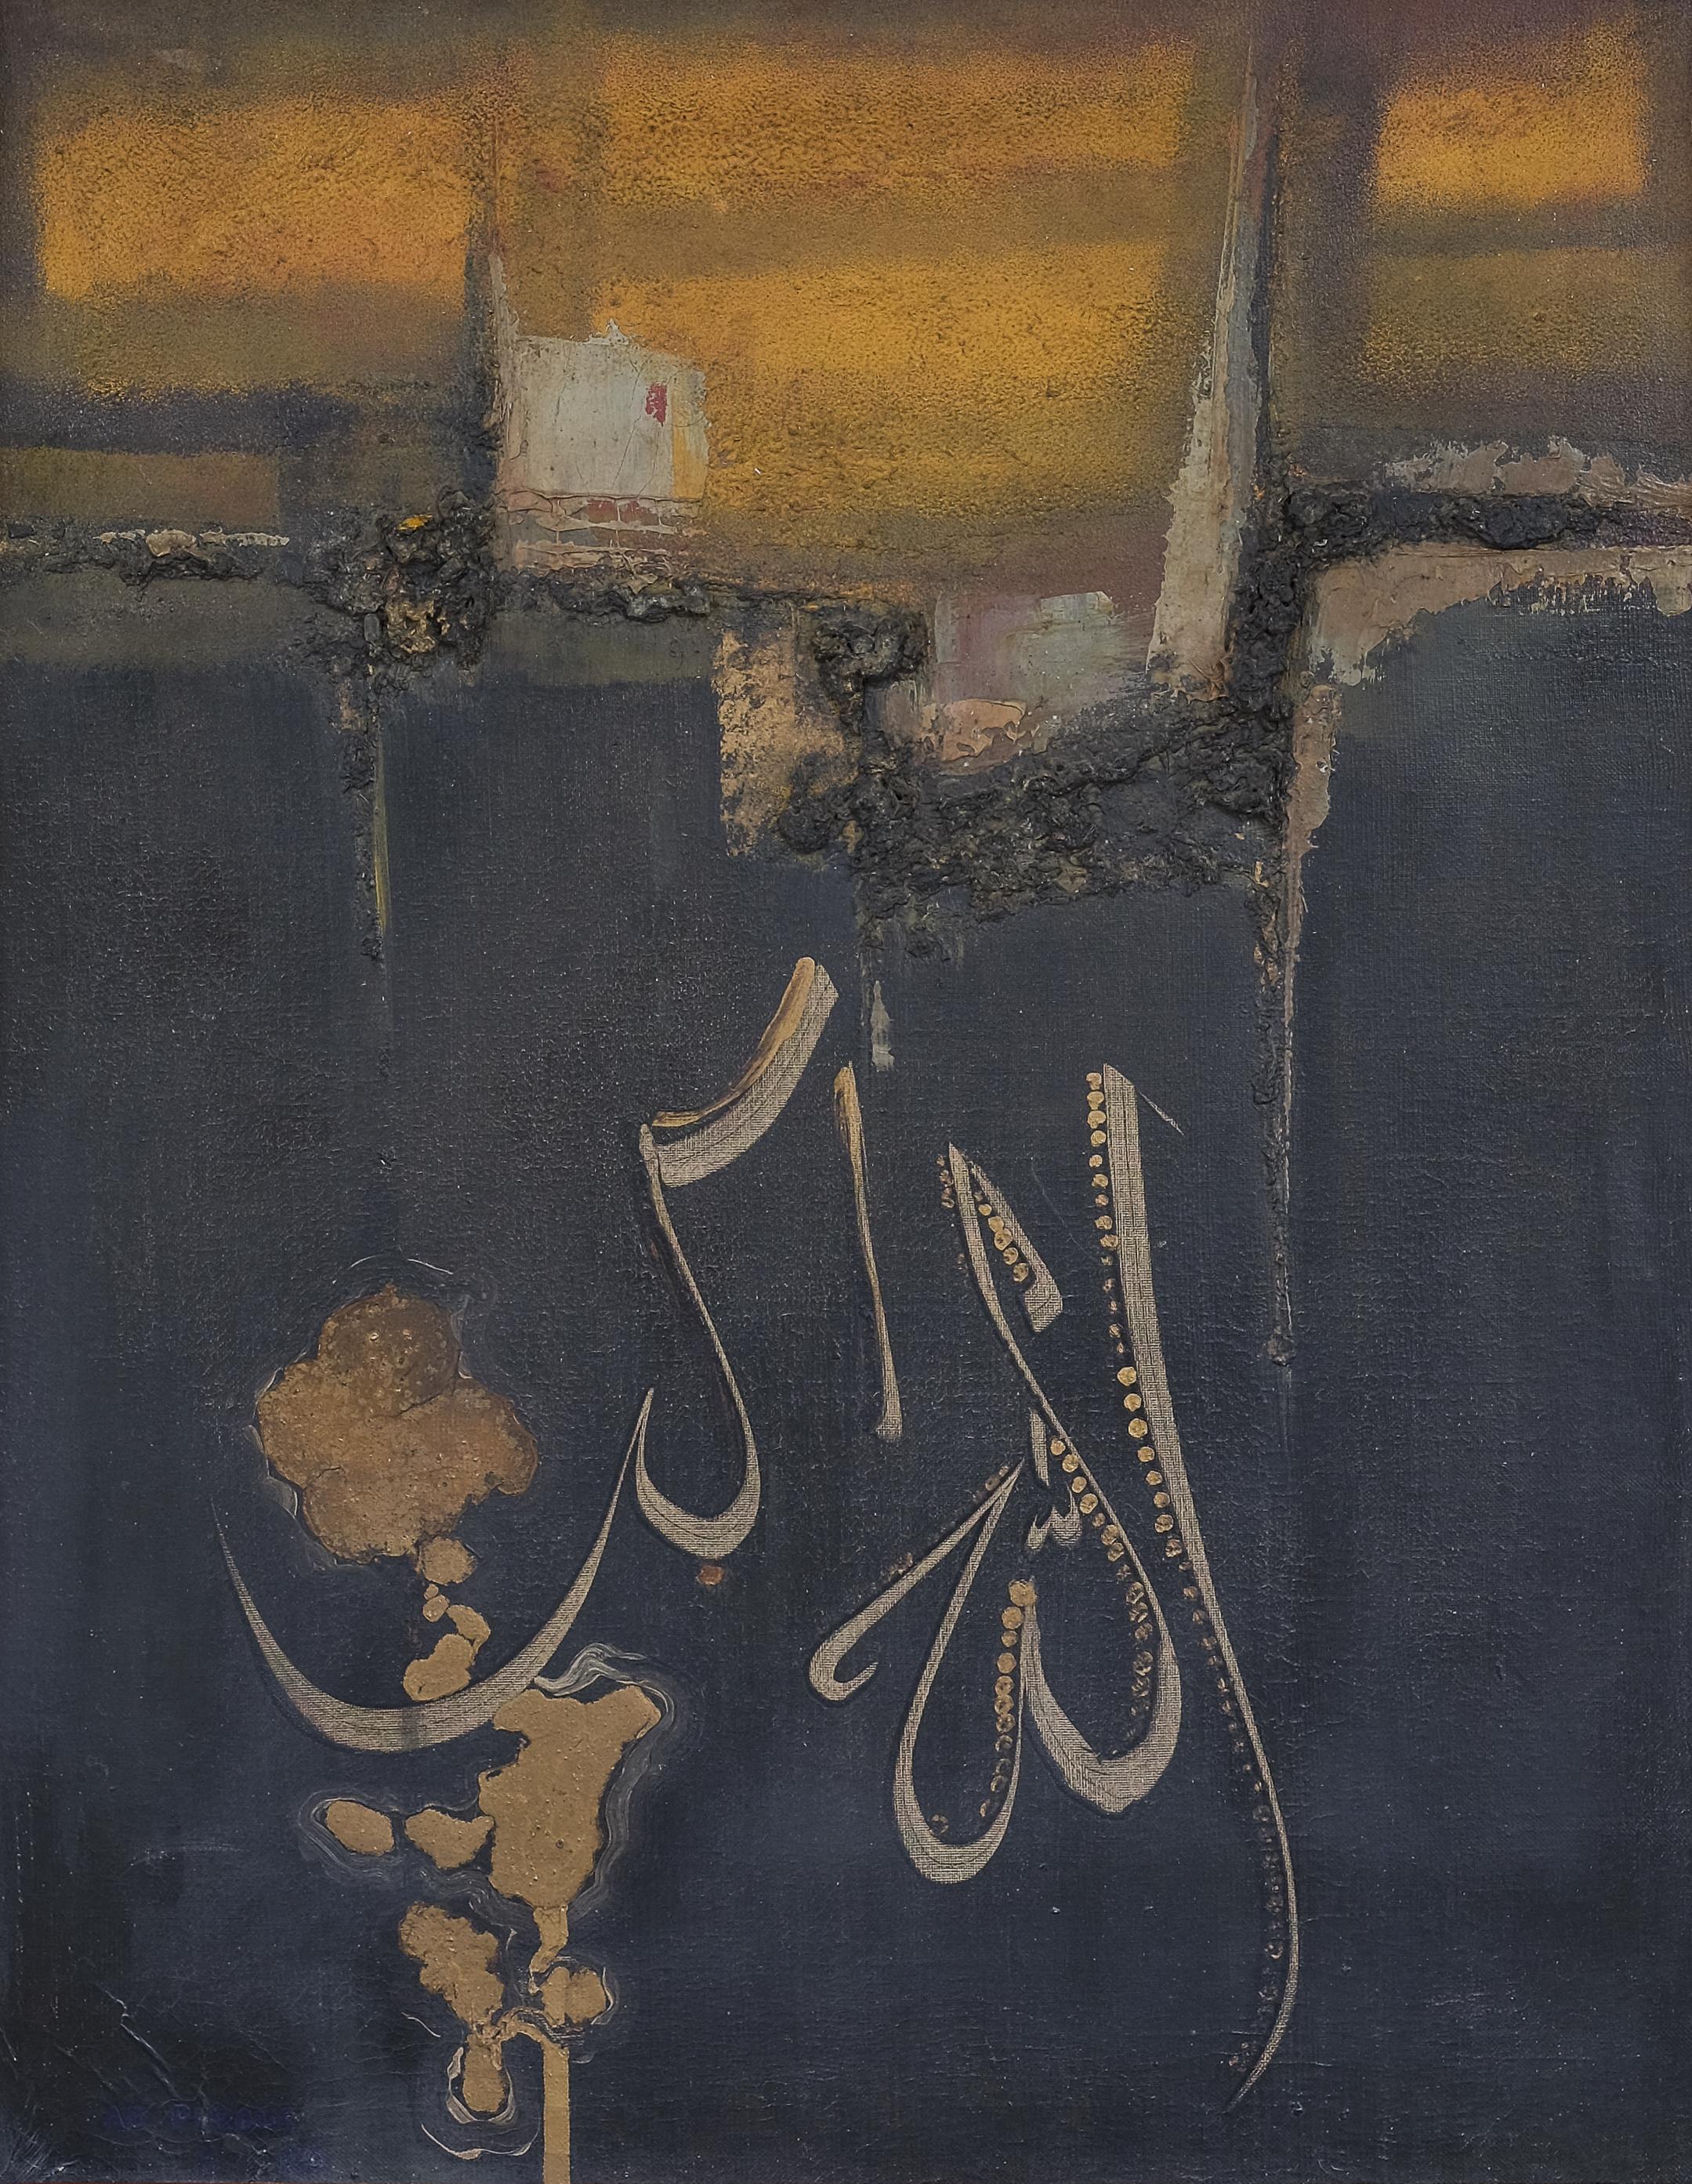 A.D. Pirous, Allahu Akbar (God Almighty), ooc, 70 x 55 cm, 1980.jpg